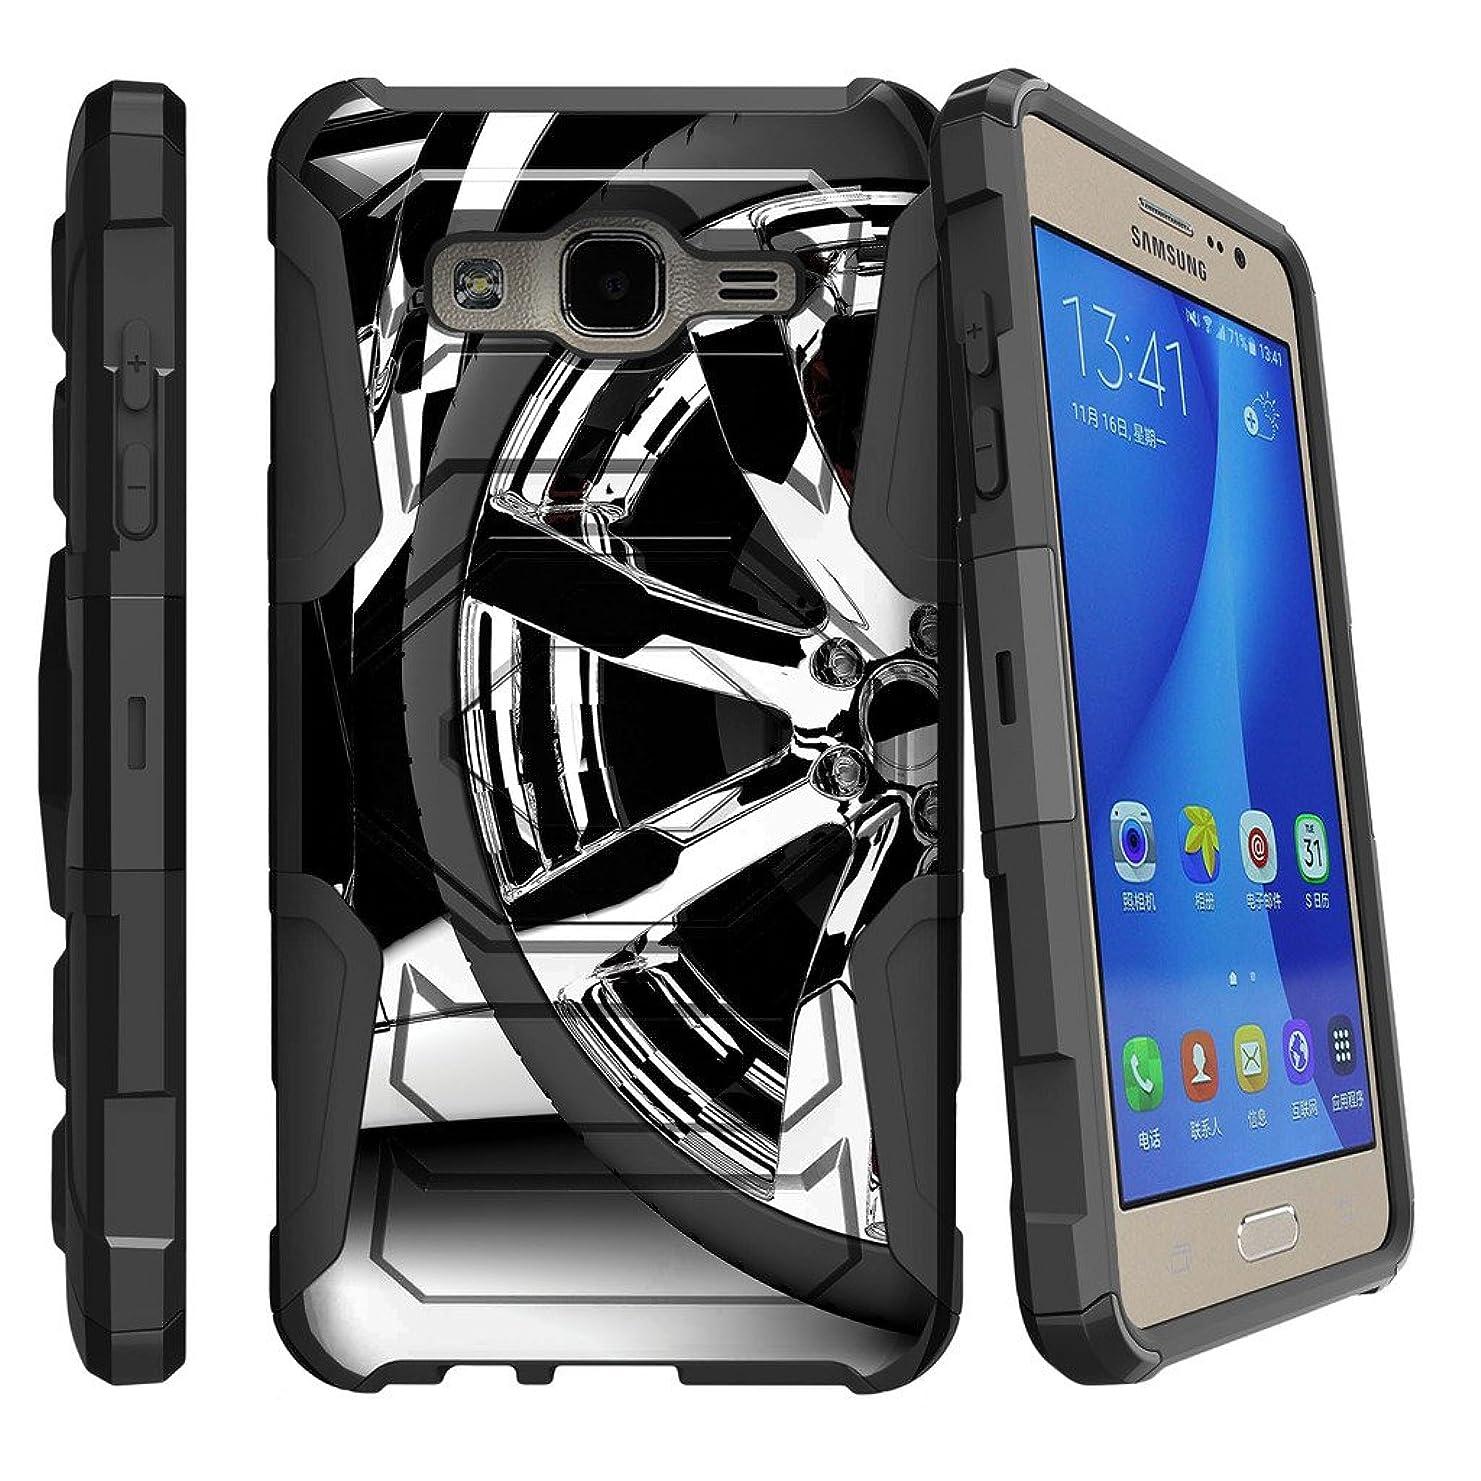 MINITURTLE Case Compatible w/Galaxy On5 Case, Samsung O5 Clip Case, G550 Cover [Armor Reloaded] Shock Rugged Clip Case w/Hard Stand Silver Rim